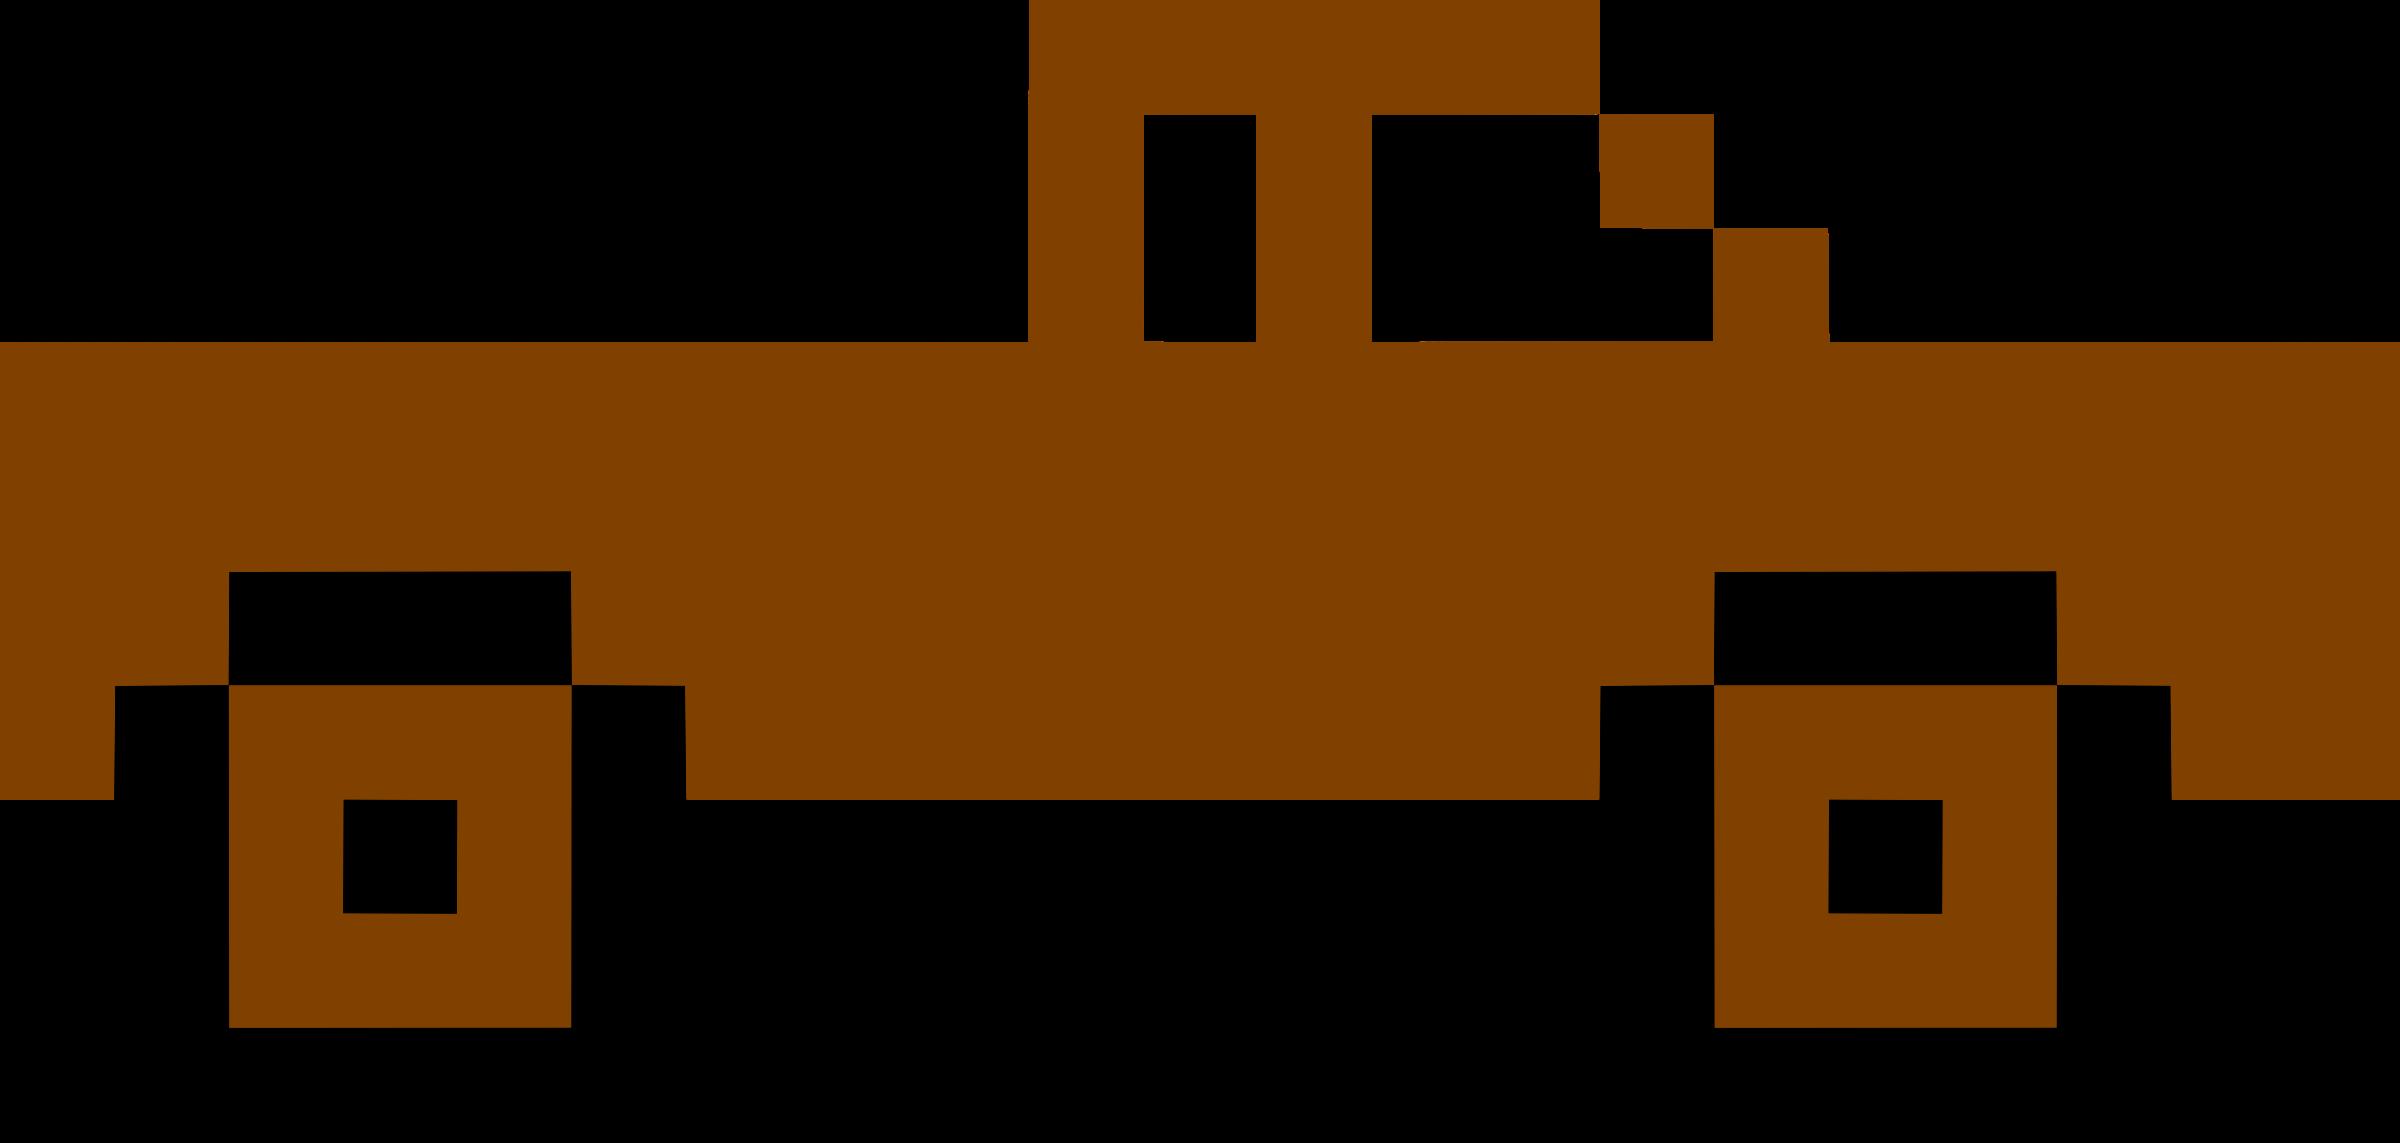 Logs clipart pixel. Art truck big image